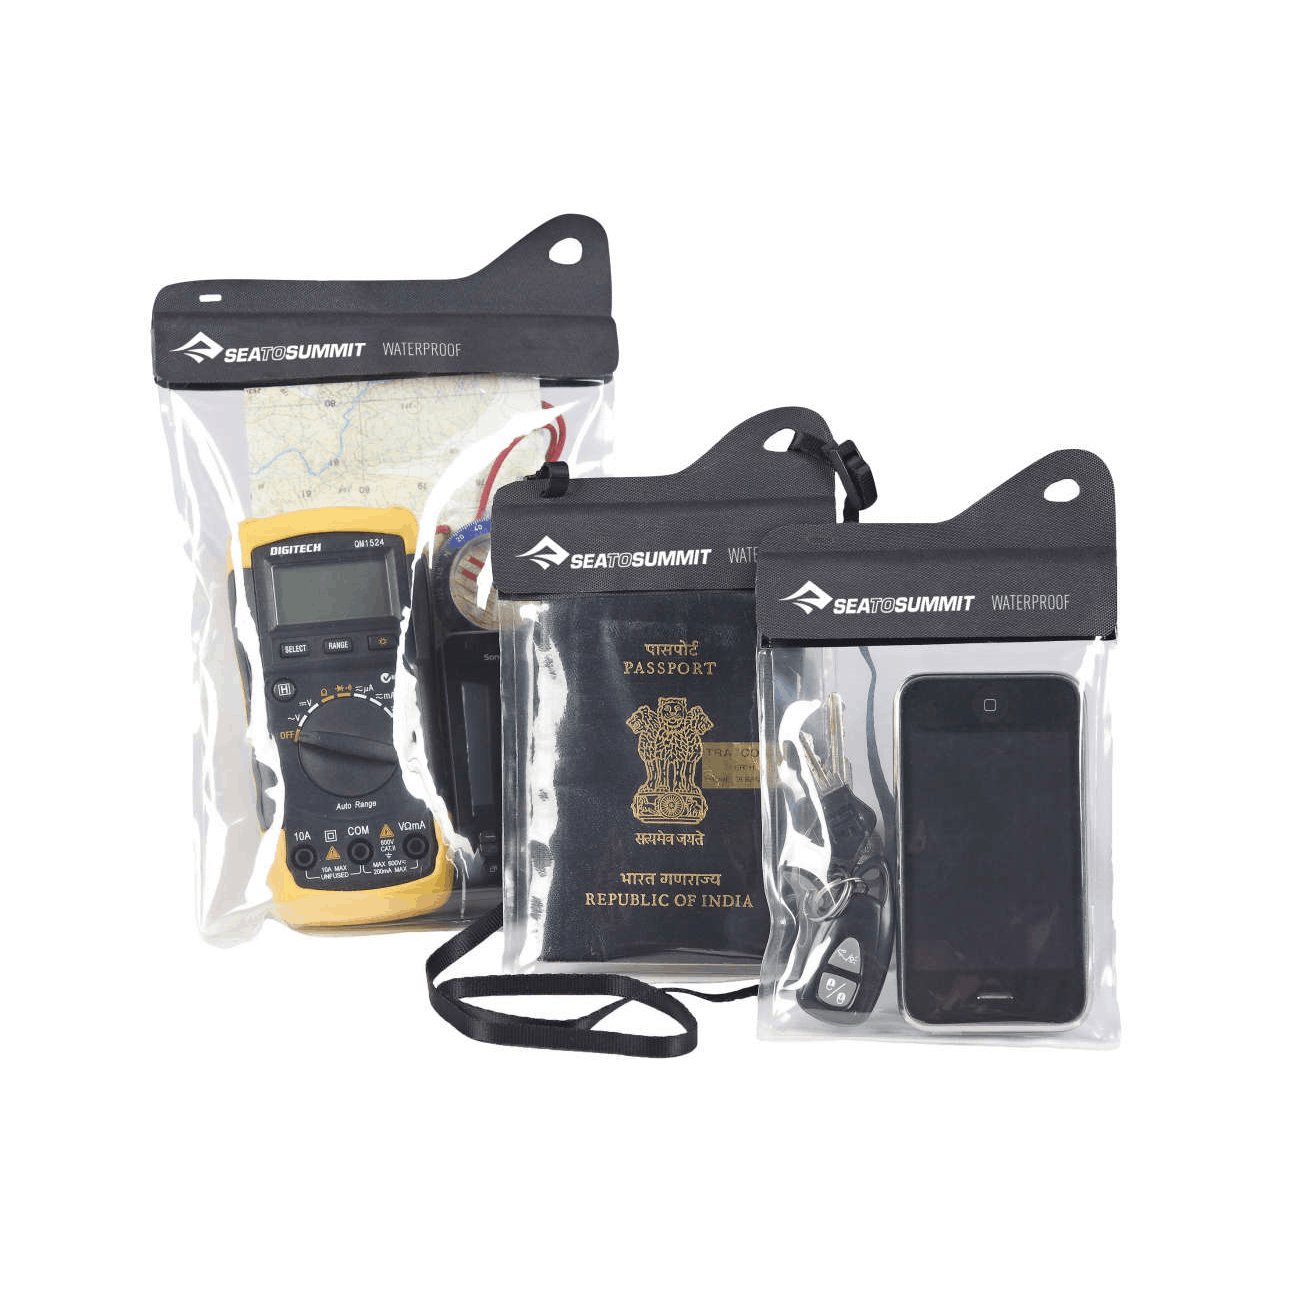 case, accessory case, tpu, water resistance